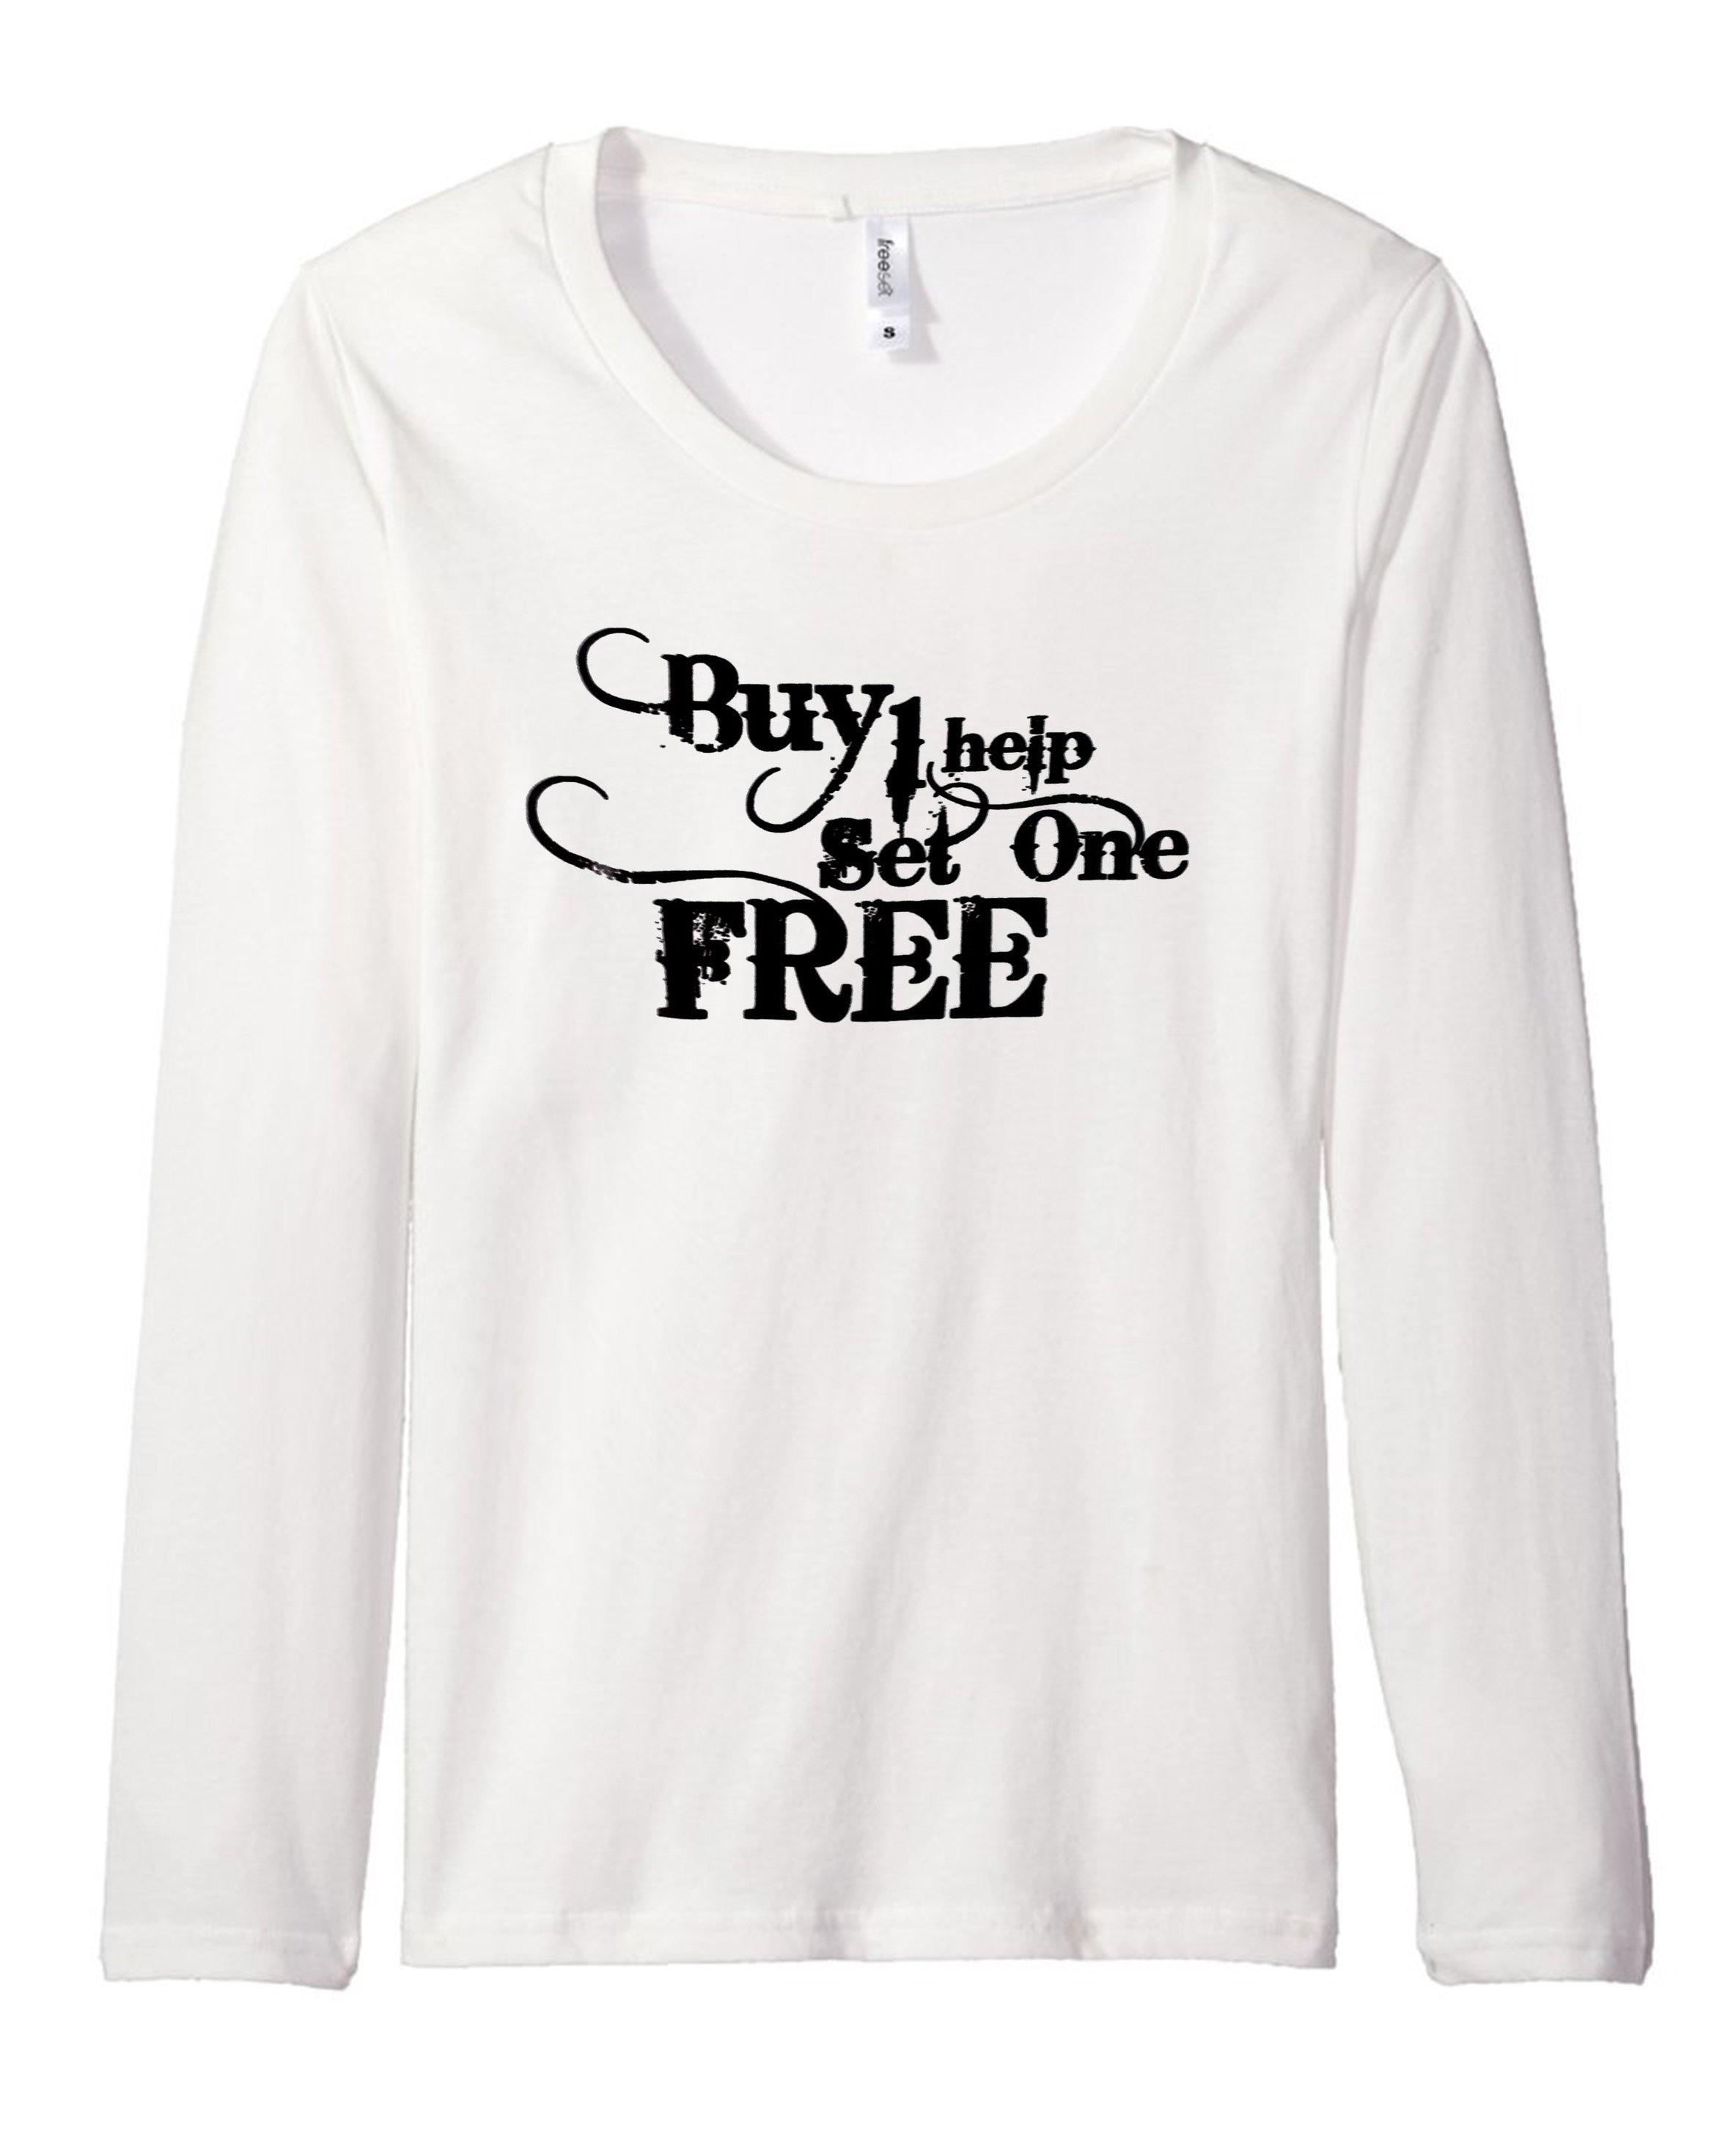 ad35e731 Buy 1 Set 1 Free Tee - Womens Long Sleeve | Products | Long sleeve ...